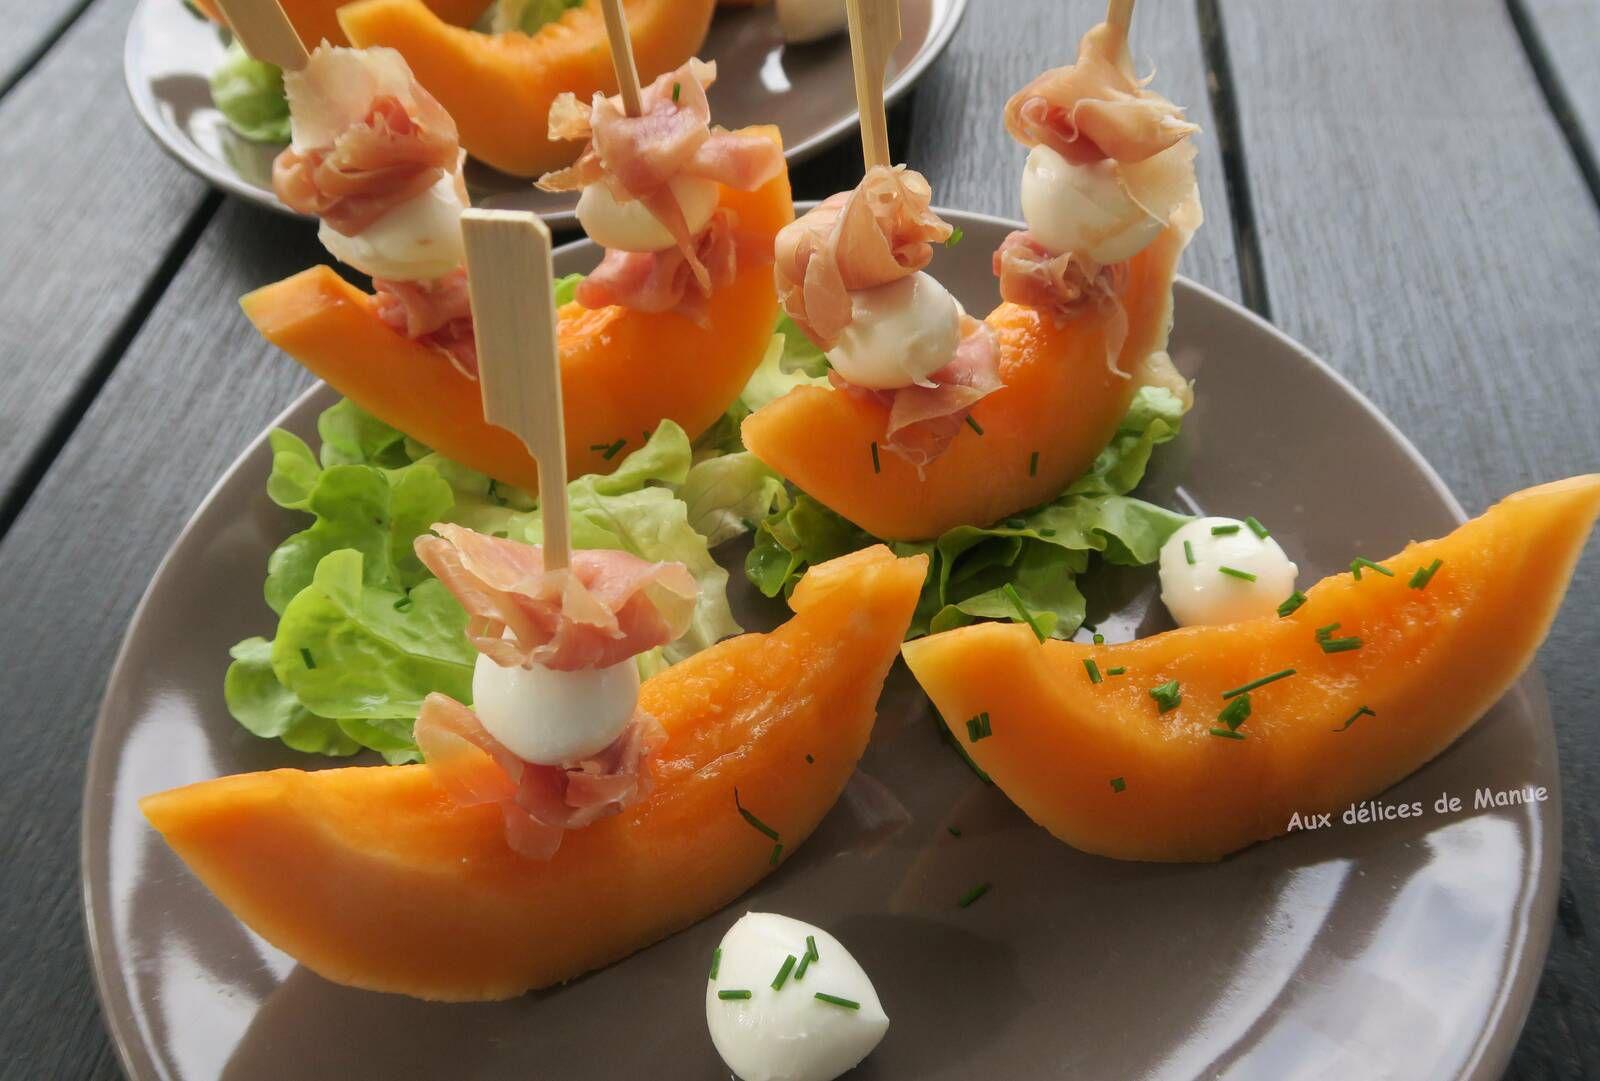 Barques de melon et leurs mâts de Serrano et mozzarella